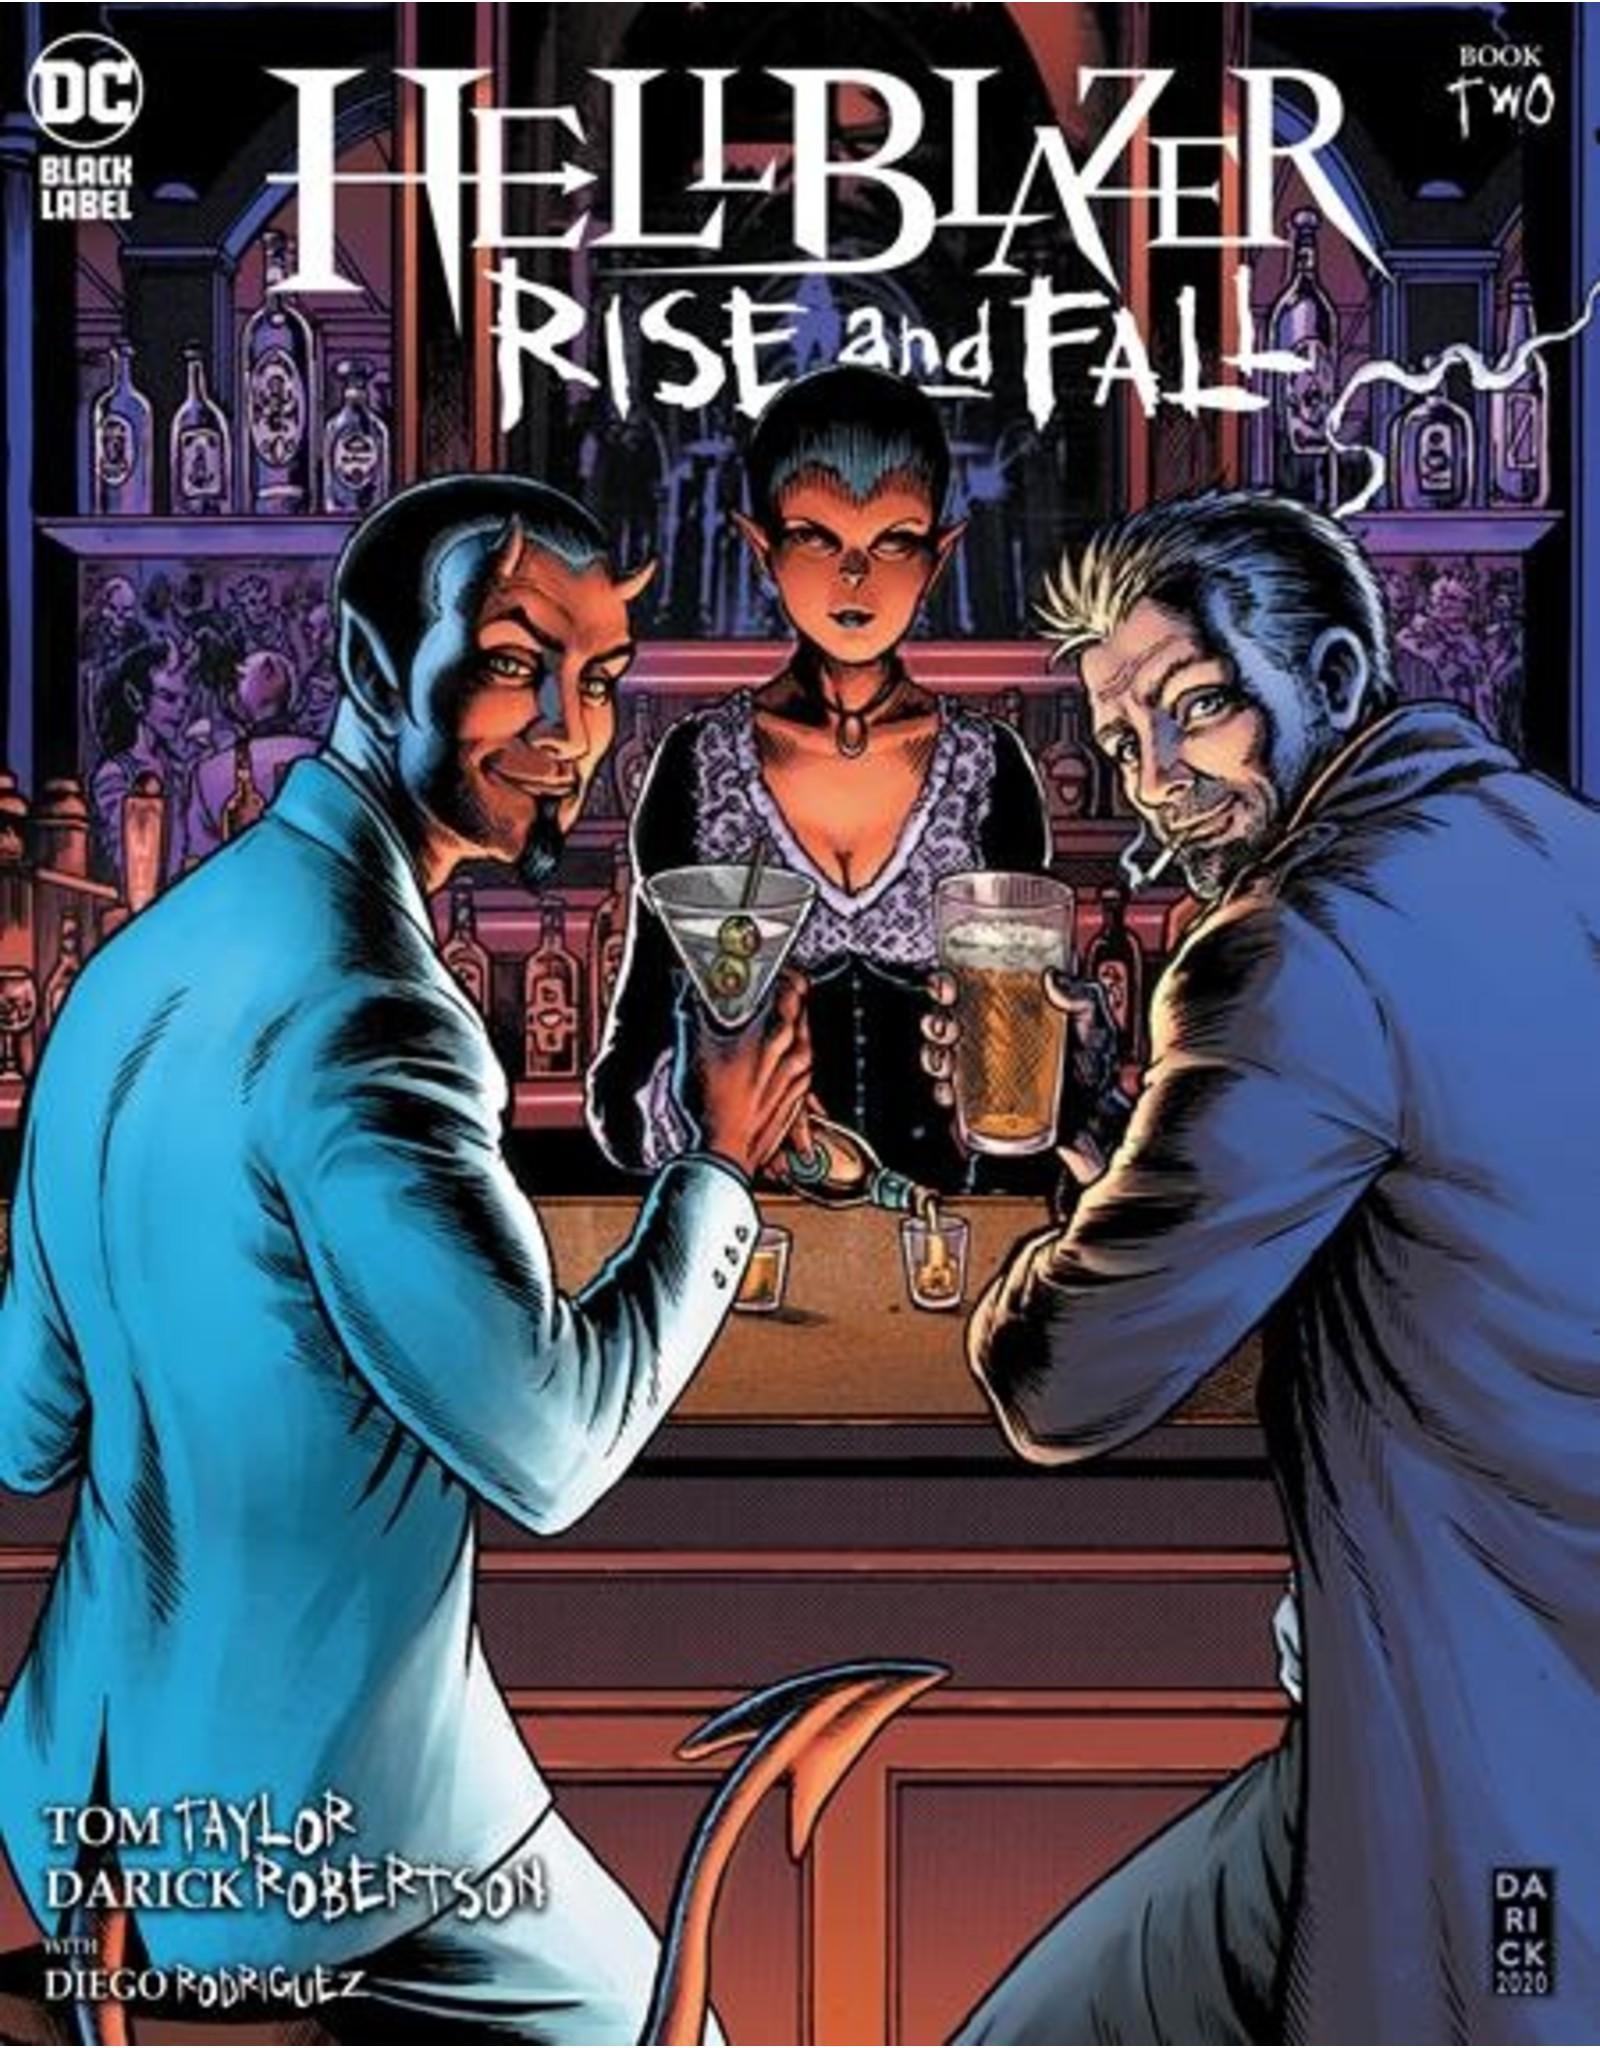 DC COMICS HELLBLAZER RISE AND FALL #2 (OF 3) CVR A DARICK ROBERTSON